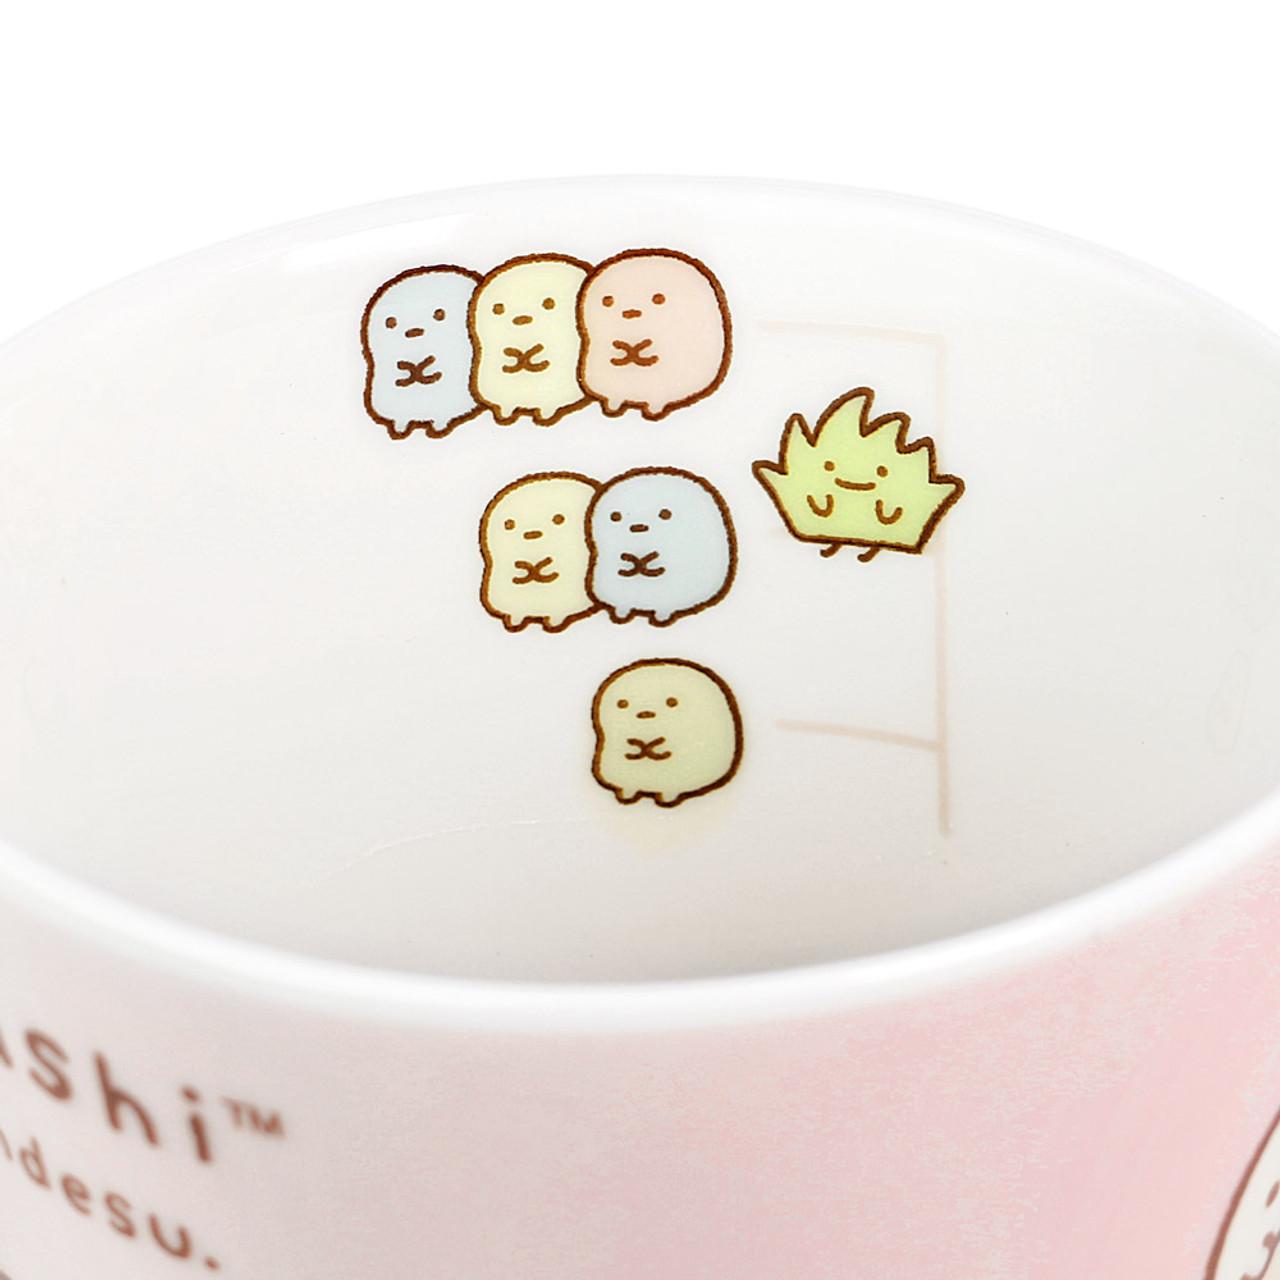 Sumikko Gurashi Measure Ceramic Cup - Horizontal ( Inner View )